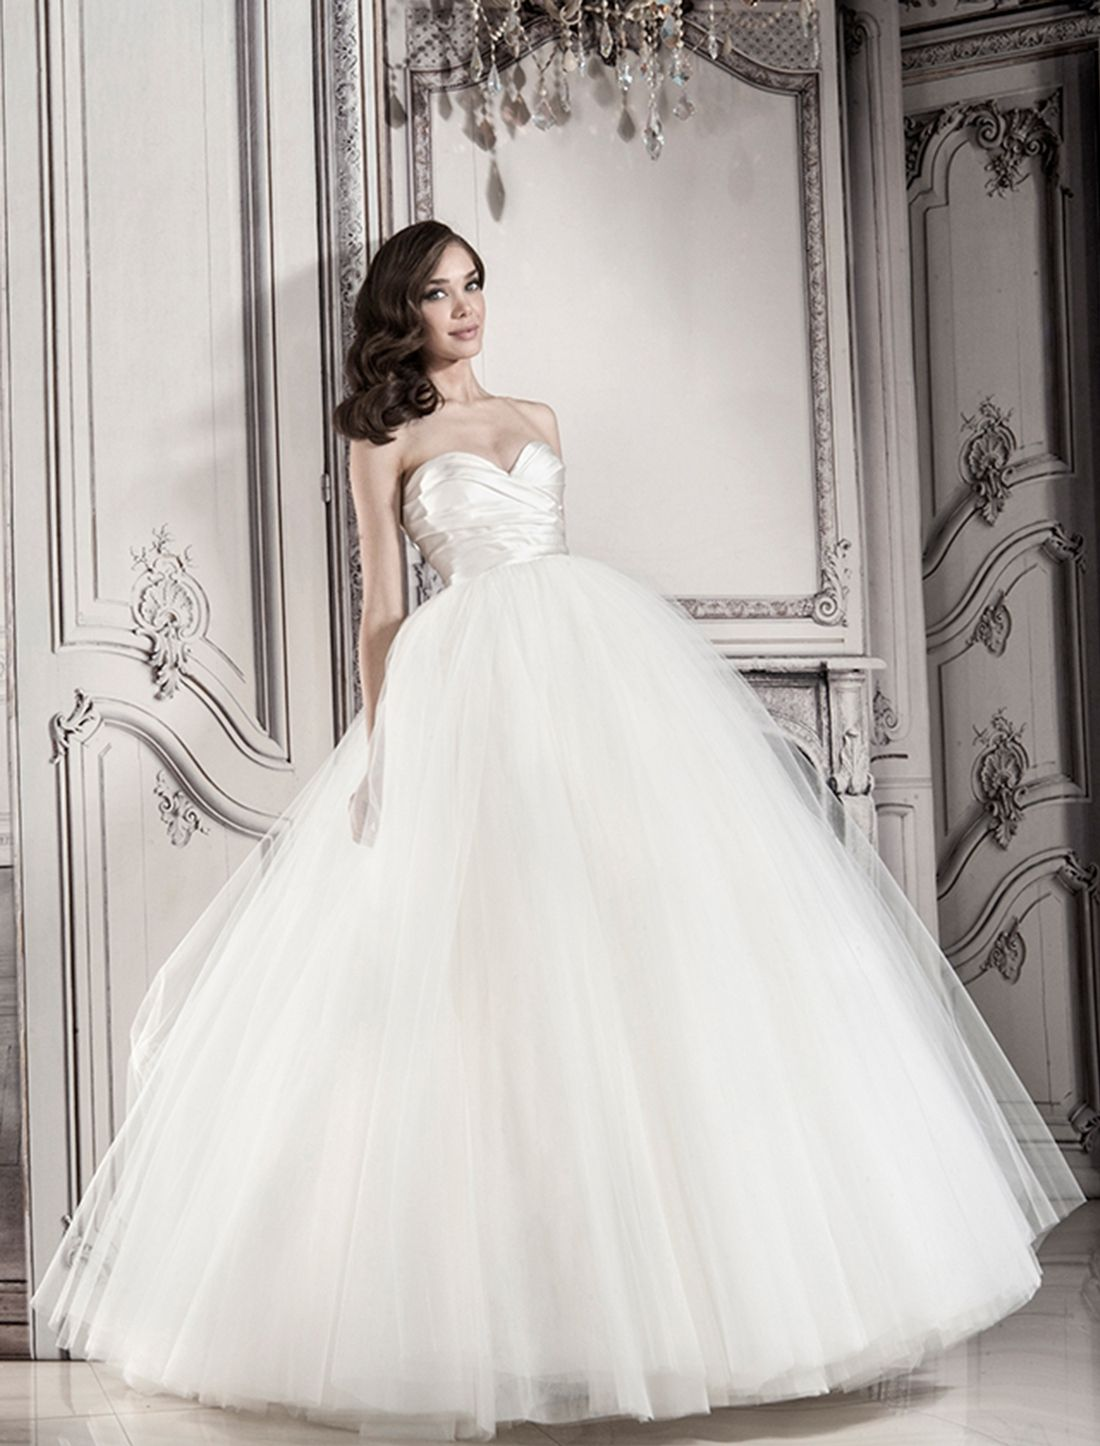 KleinfeldBridal.com: Pnina Tornai: Bridal Gown: 32848202: Princess ...